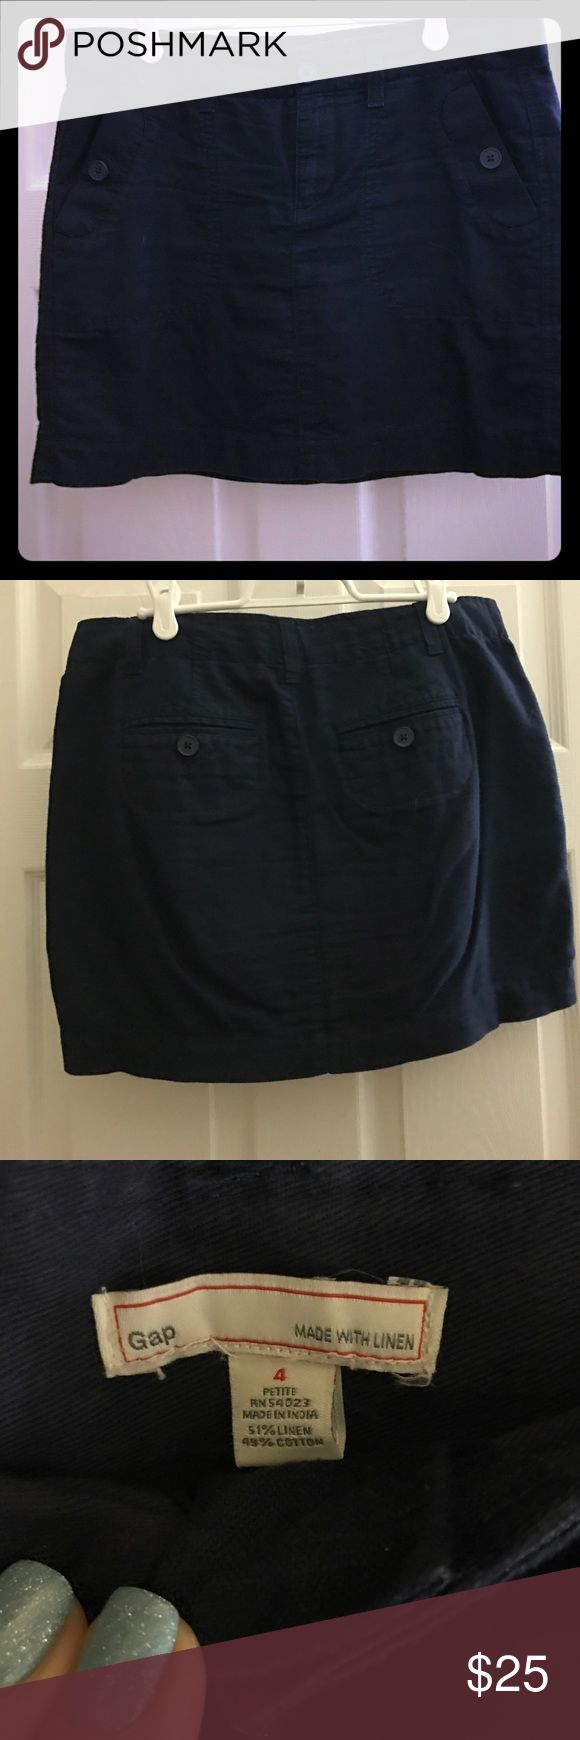 Navy linen skirt Navy linen-blend skirt. EUC. Comes from a smoke free home. GAP Skirts Mini